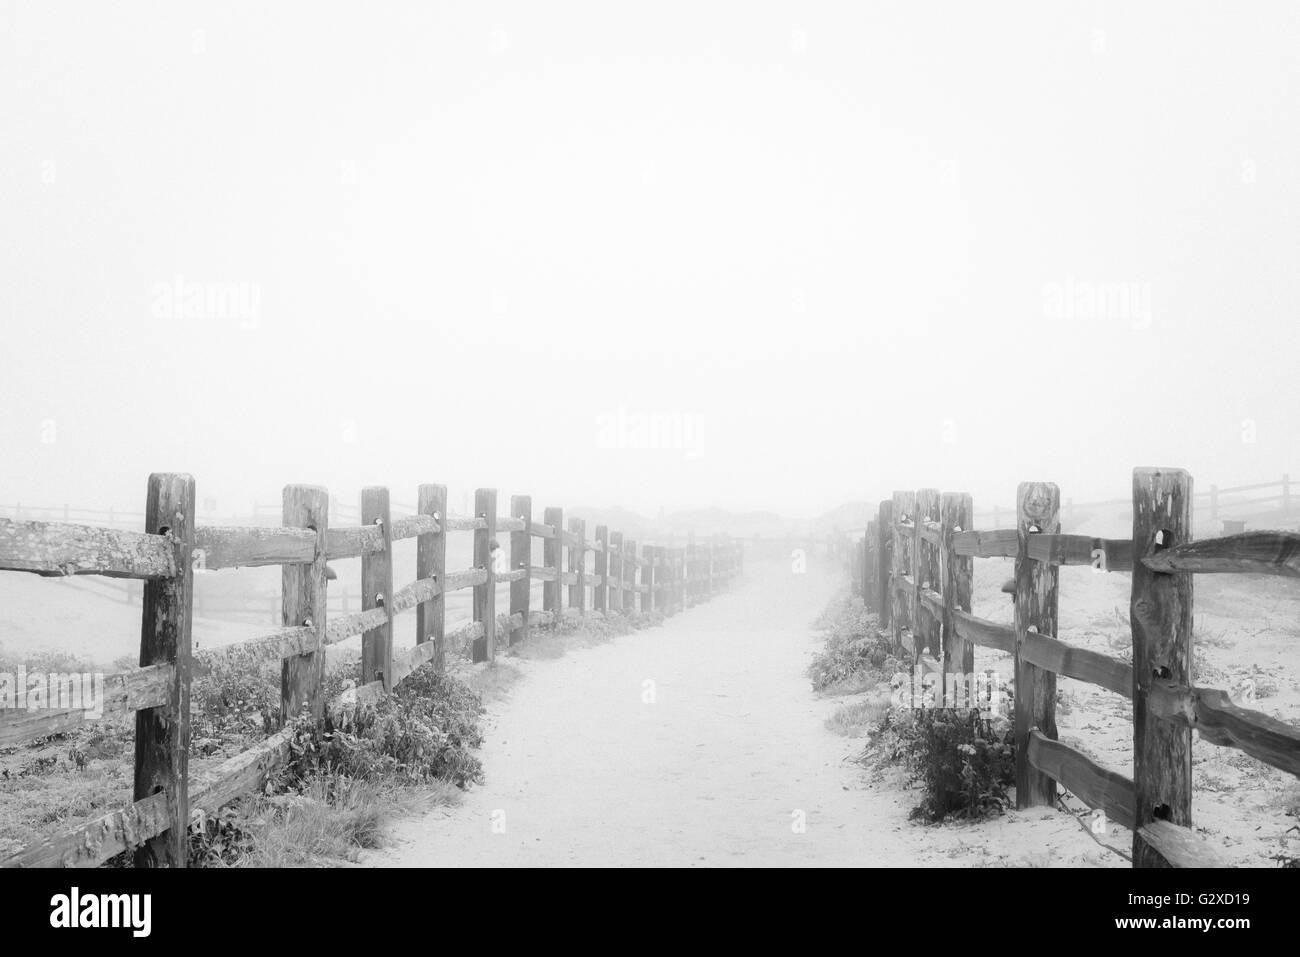 Dans le brouillard. Photo Stock